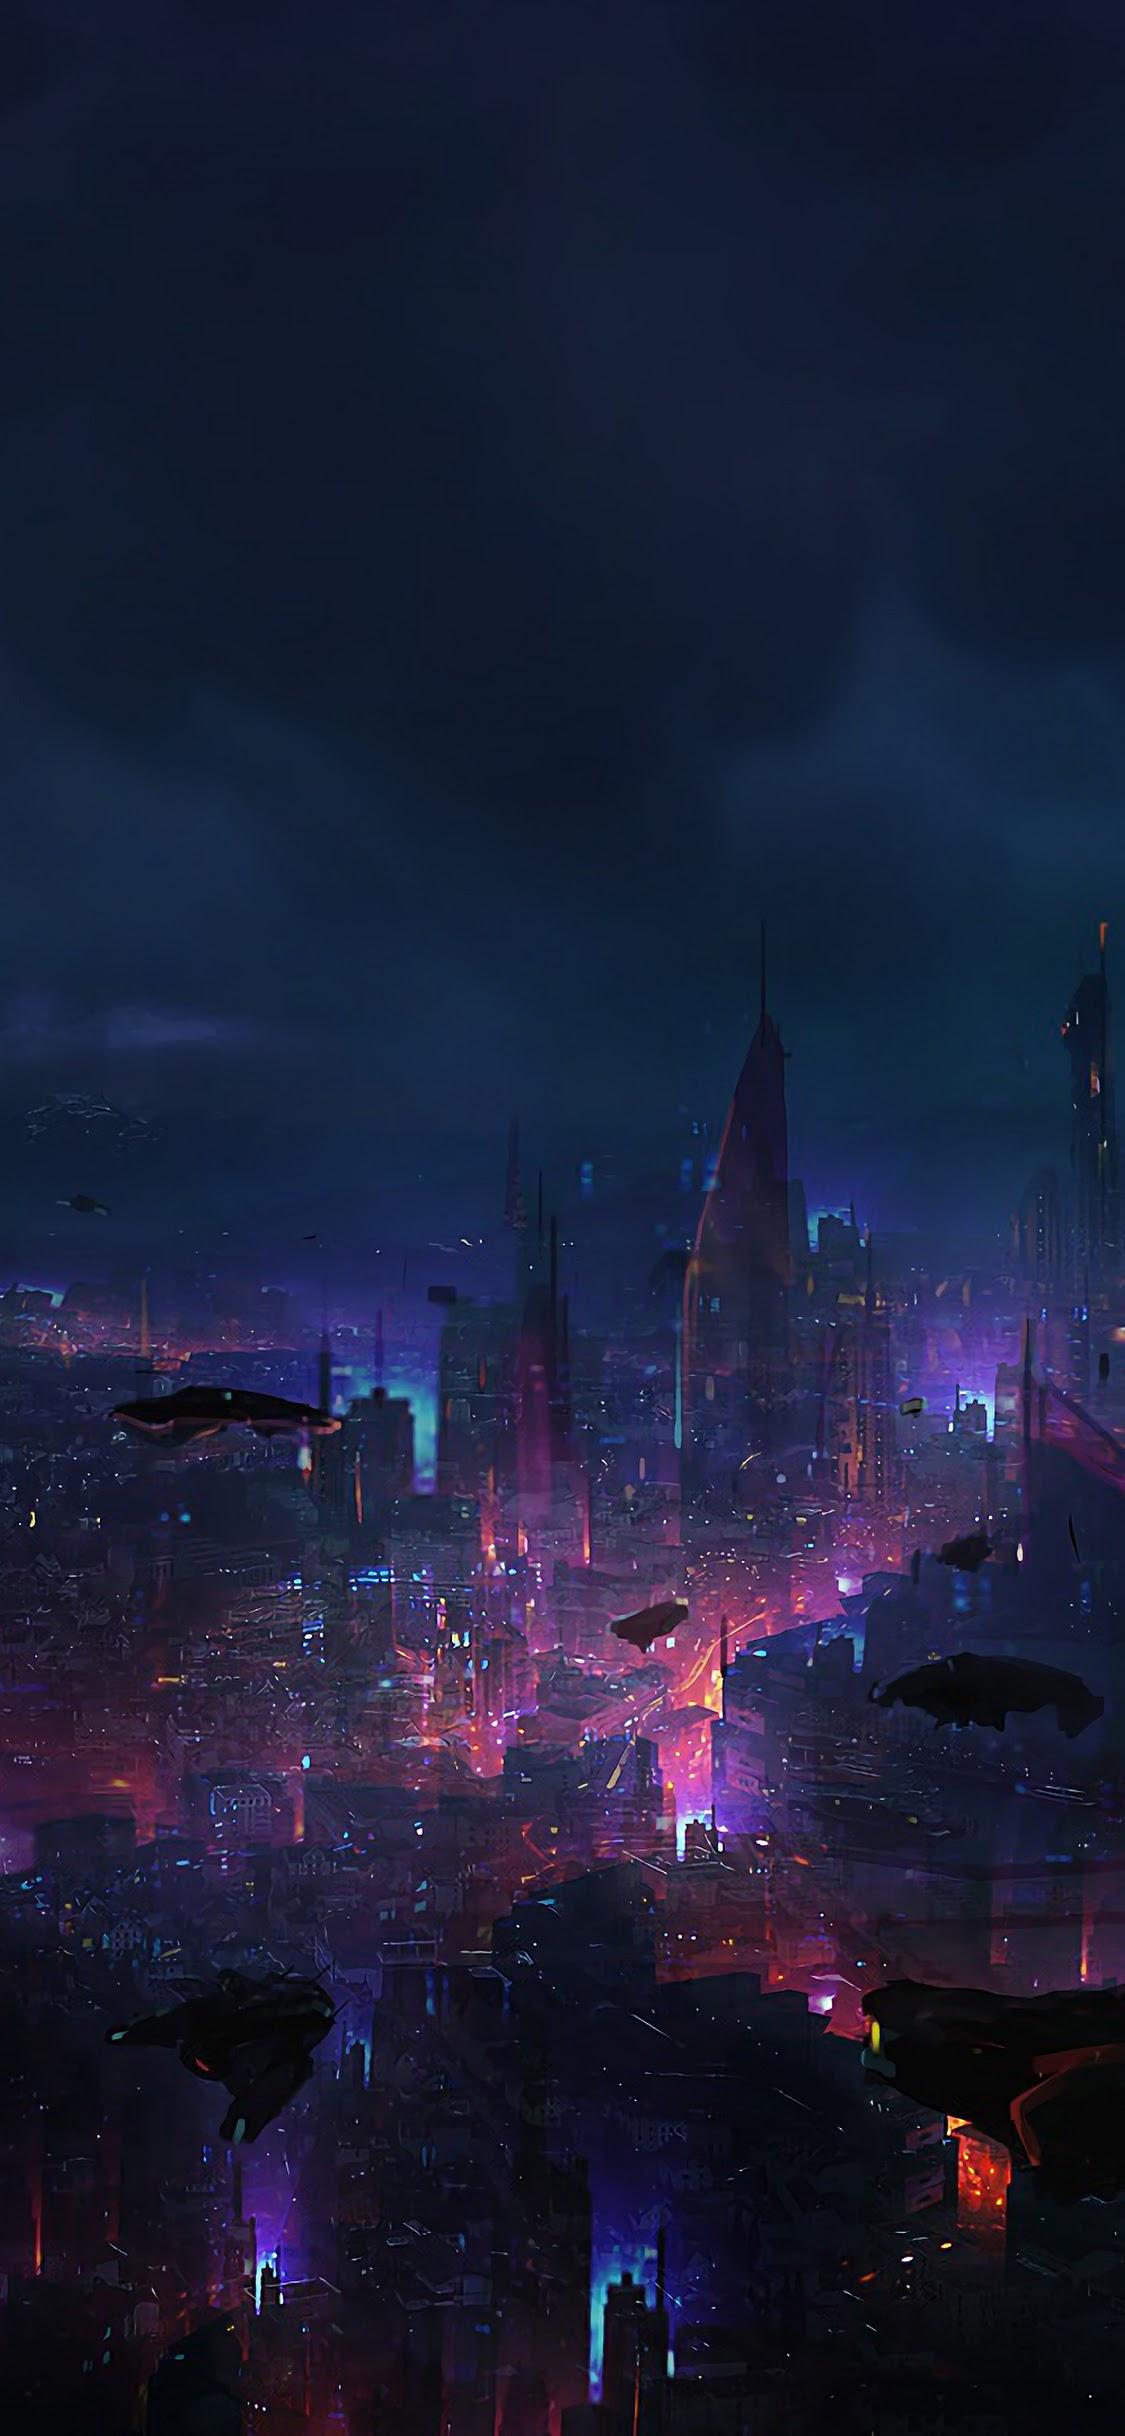 Cyberpunk City Night Scenery Sci Fi 4k Wallpaper 94